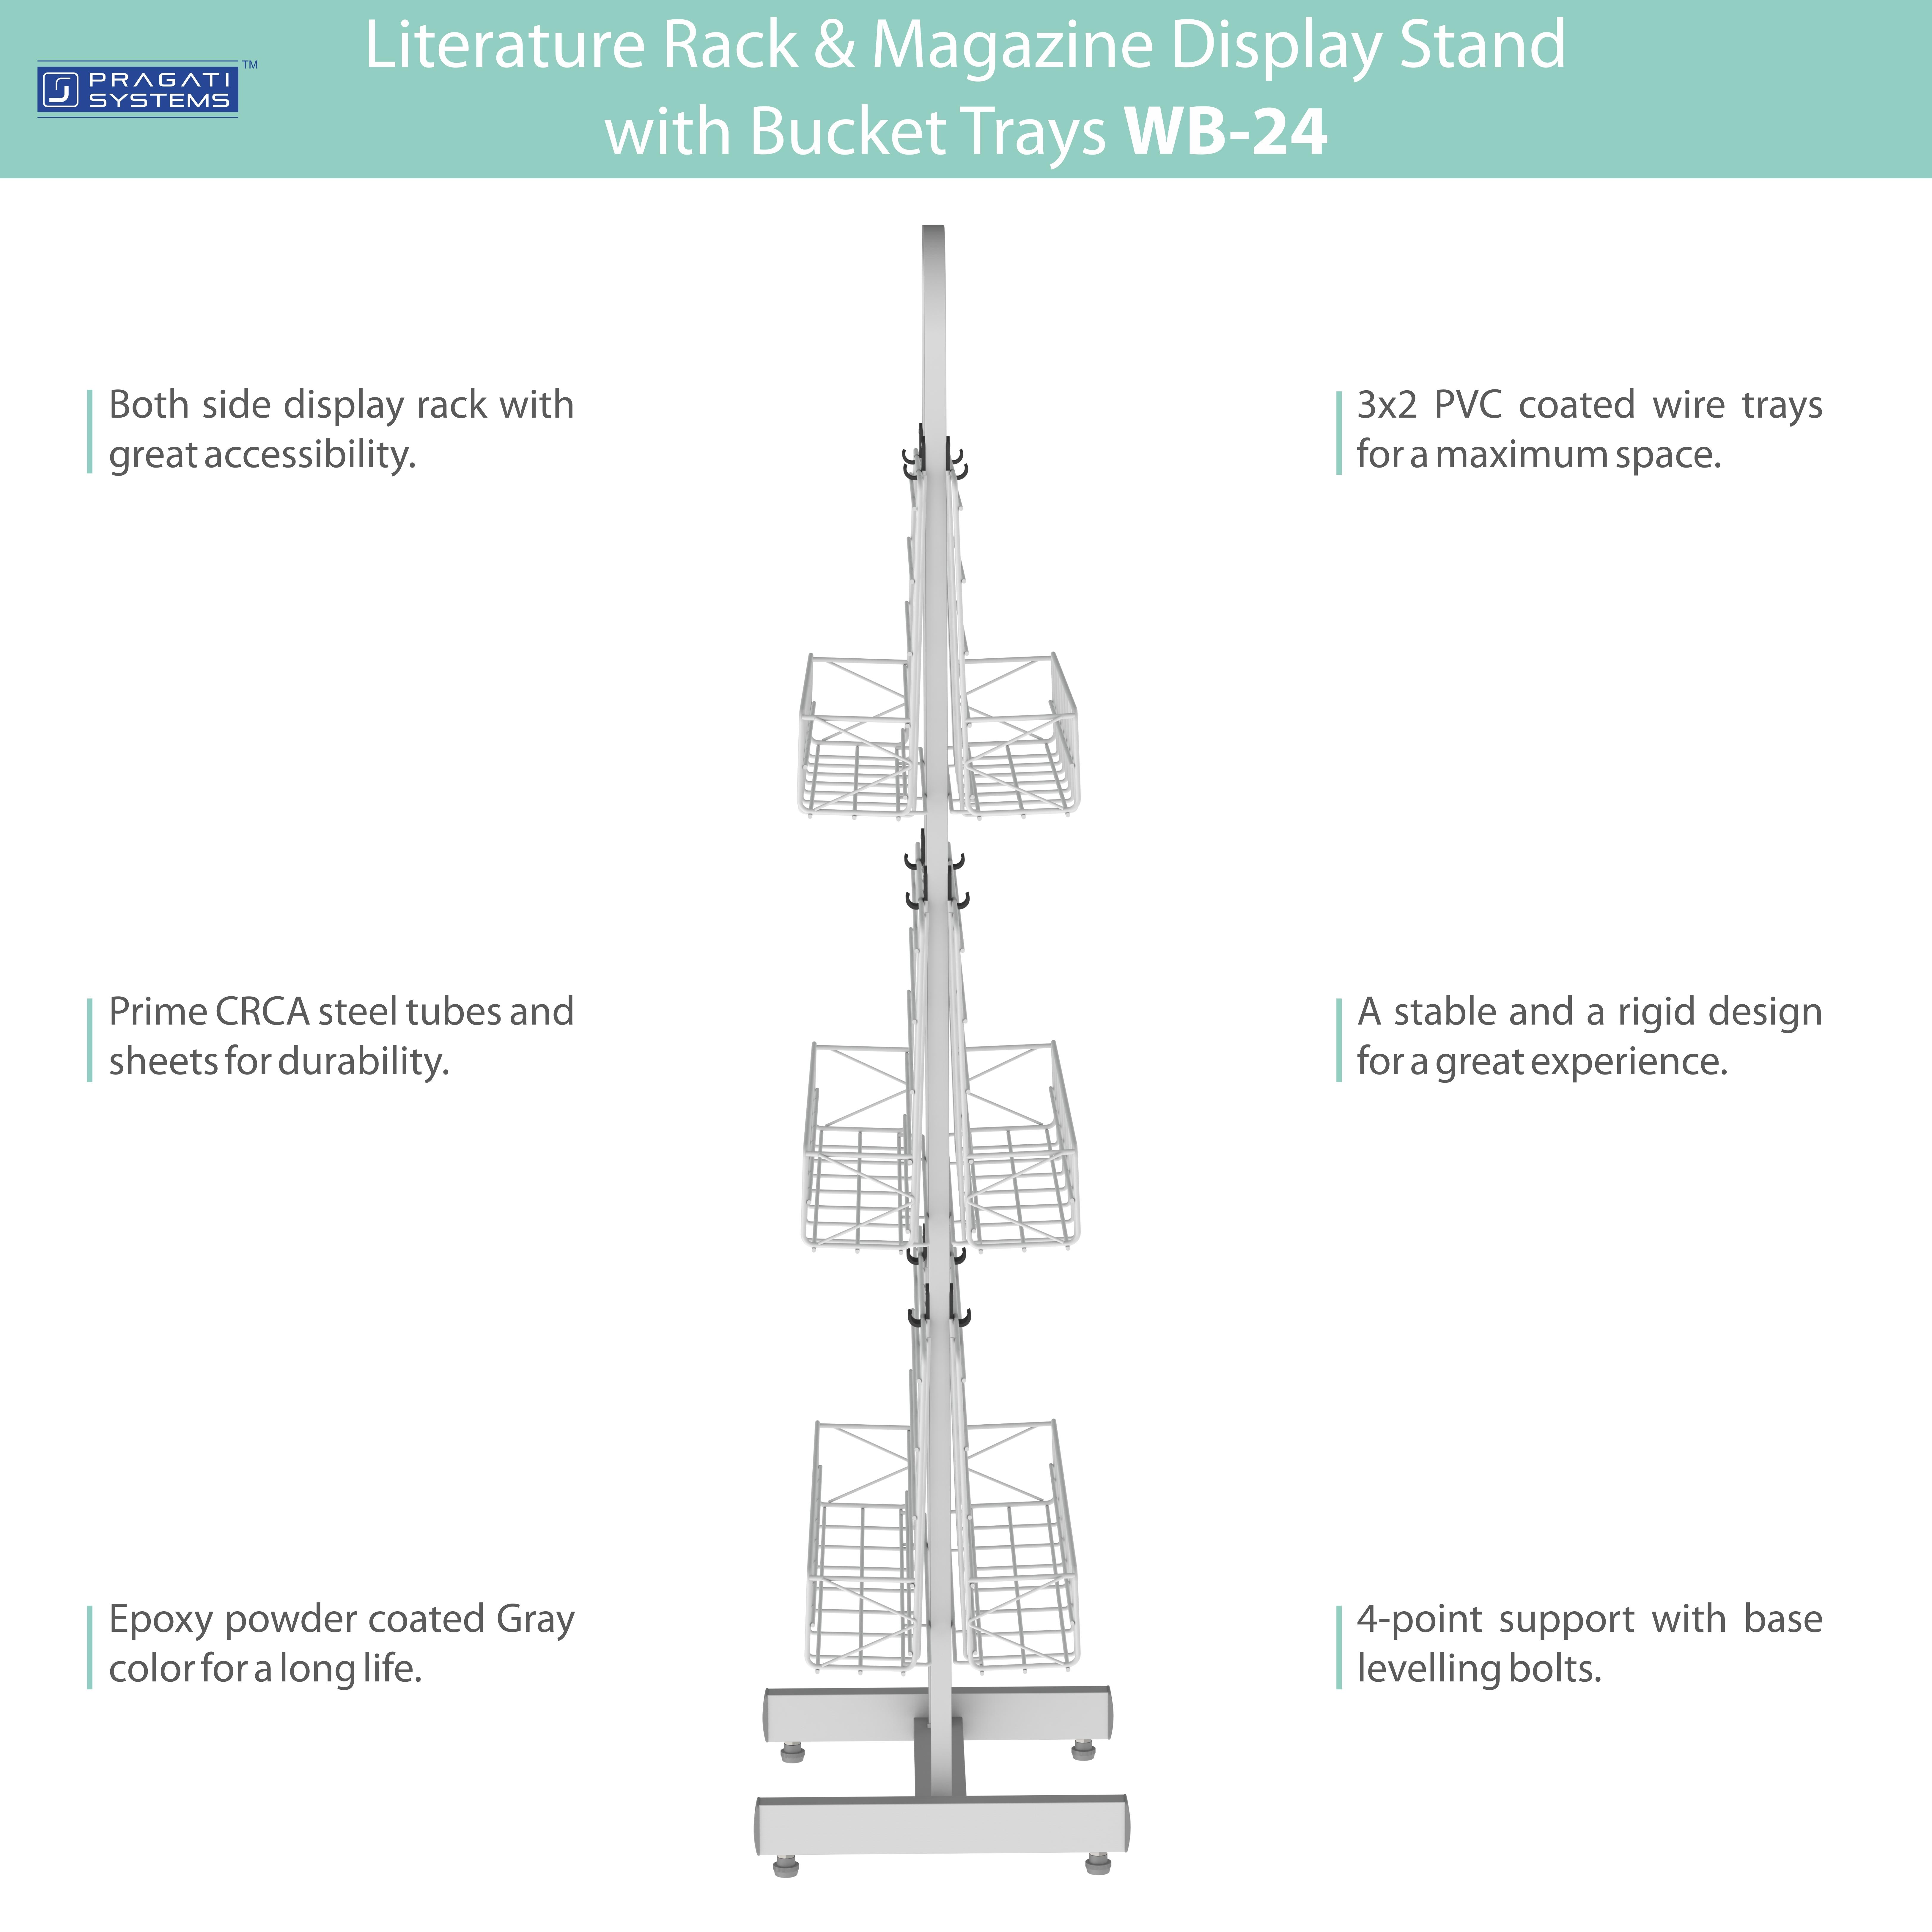 WB-24 Literature Rack & Magazine Display Stand